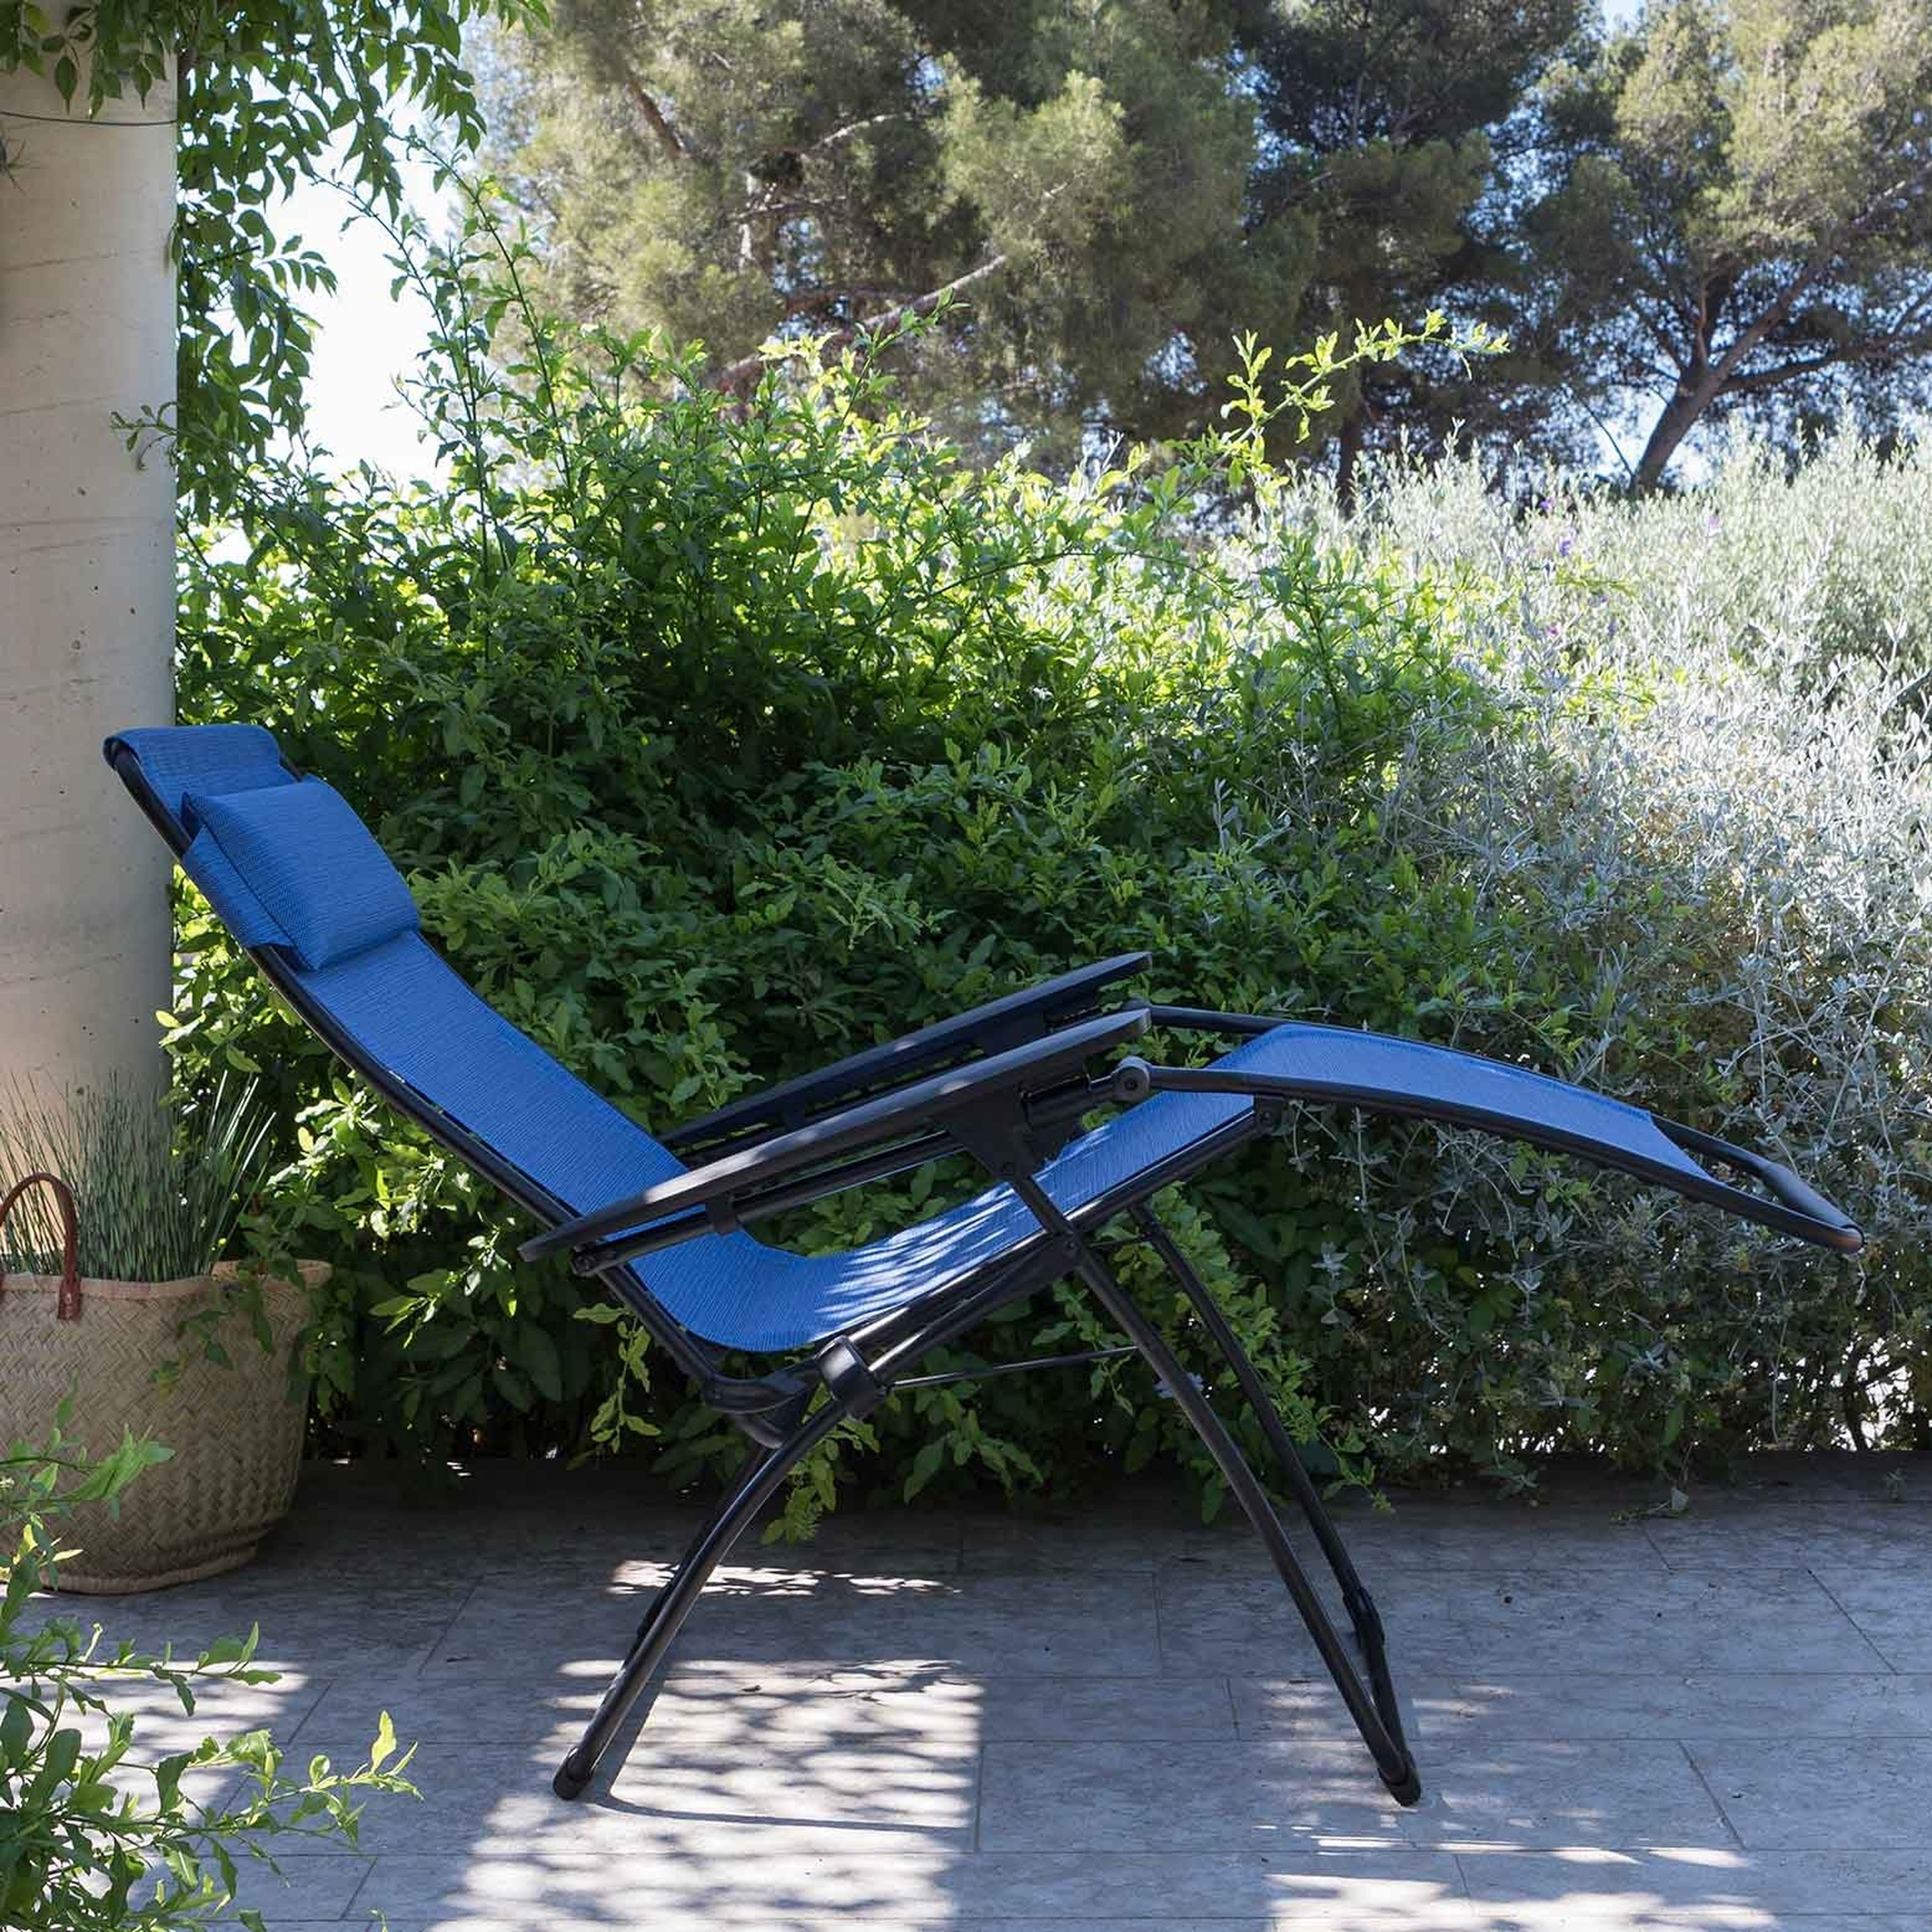 lfm3113-8225-2-fauteuil-relax_7